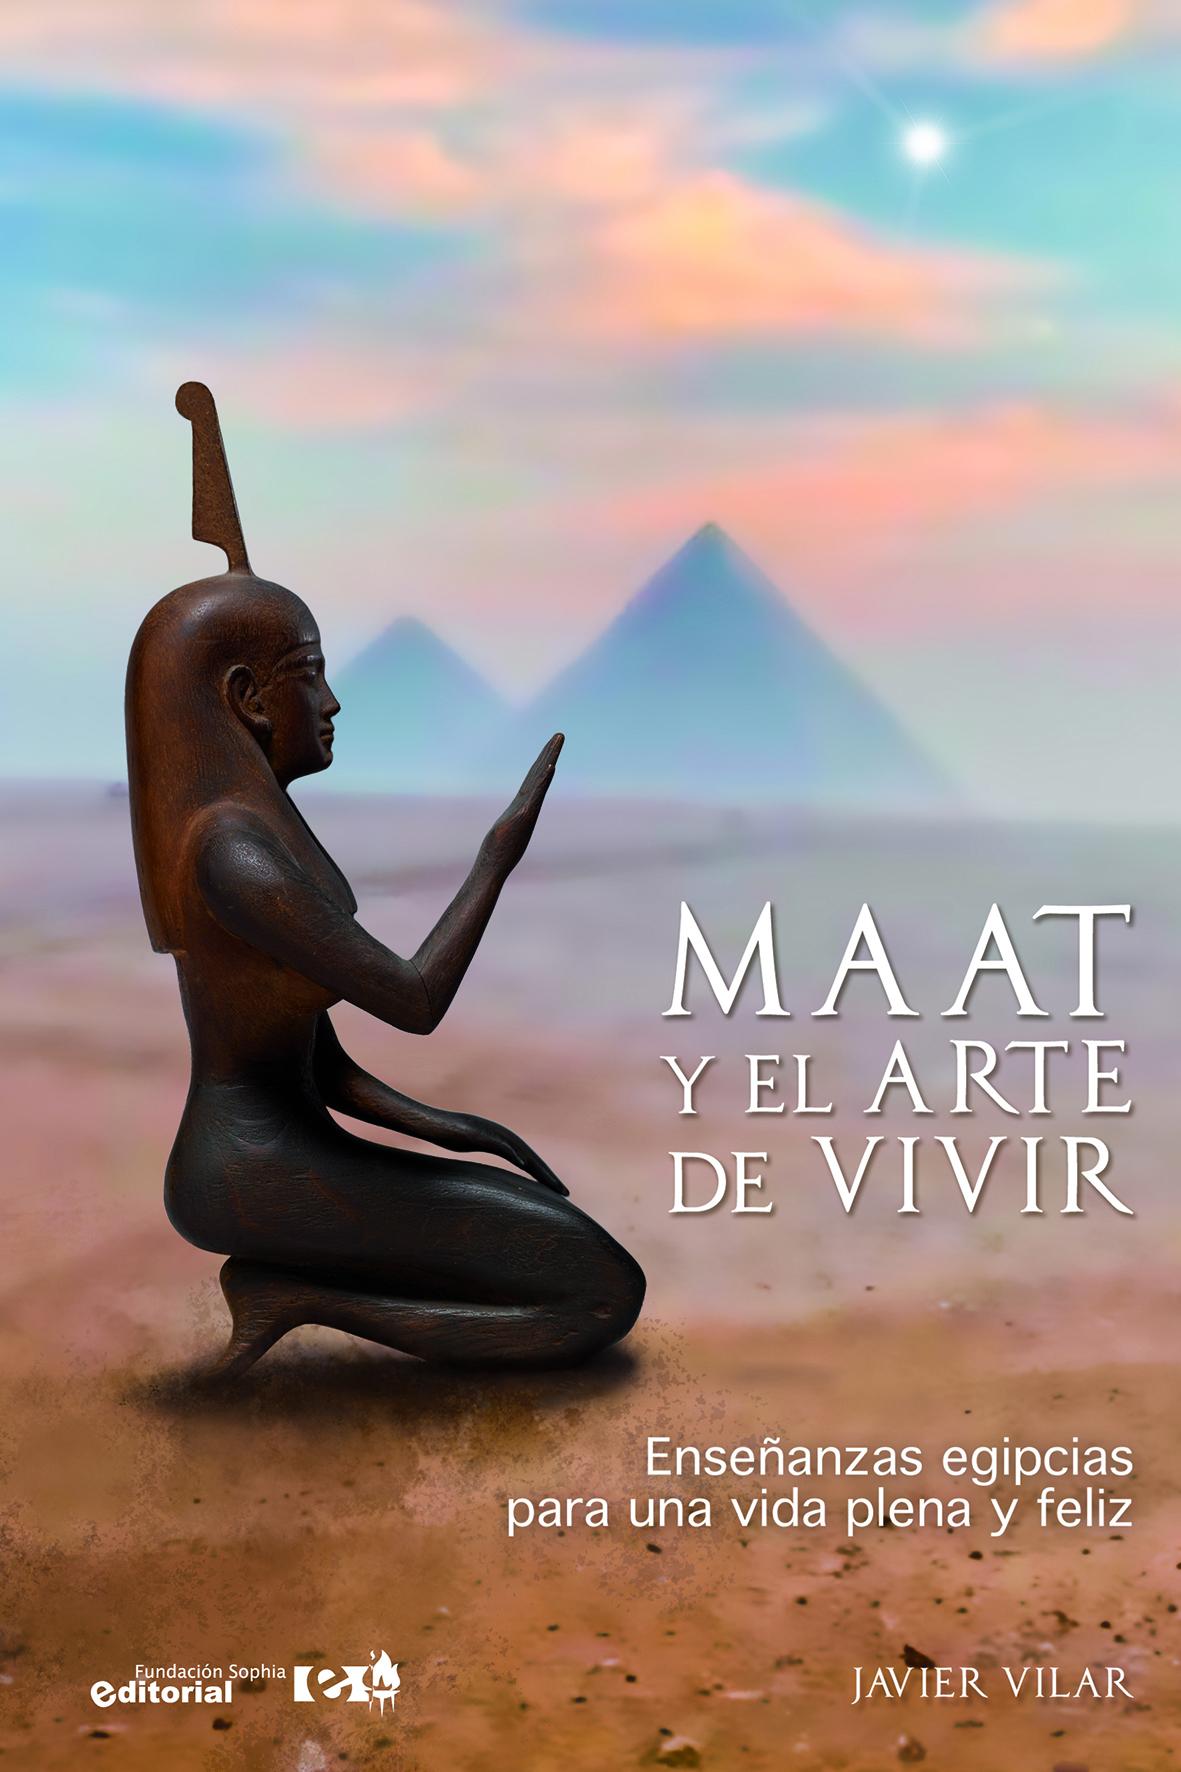 Maat y el Arte de Vivir - Javier Vilar